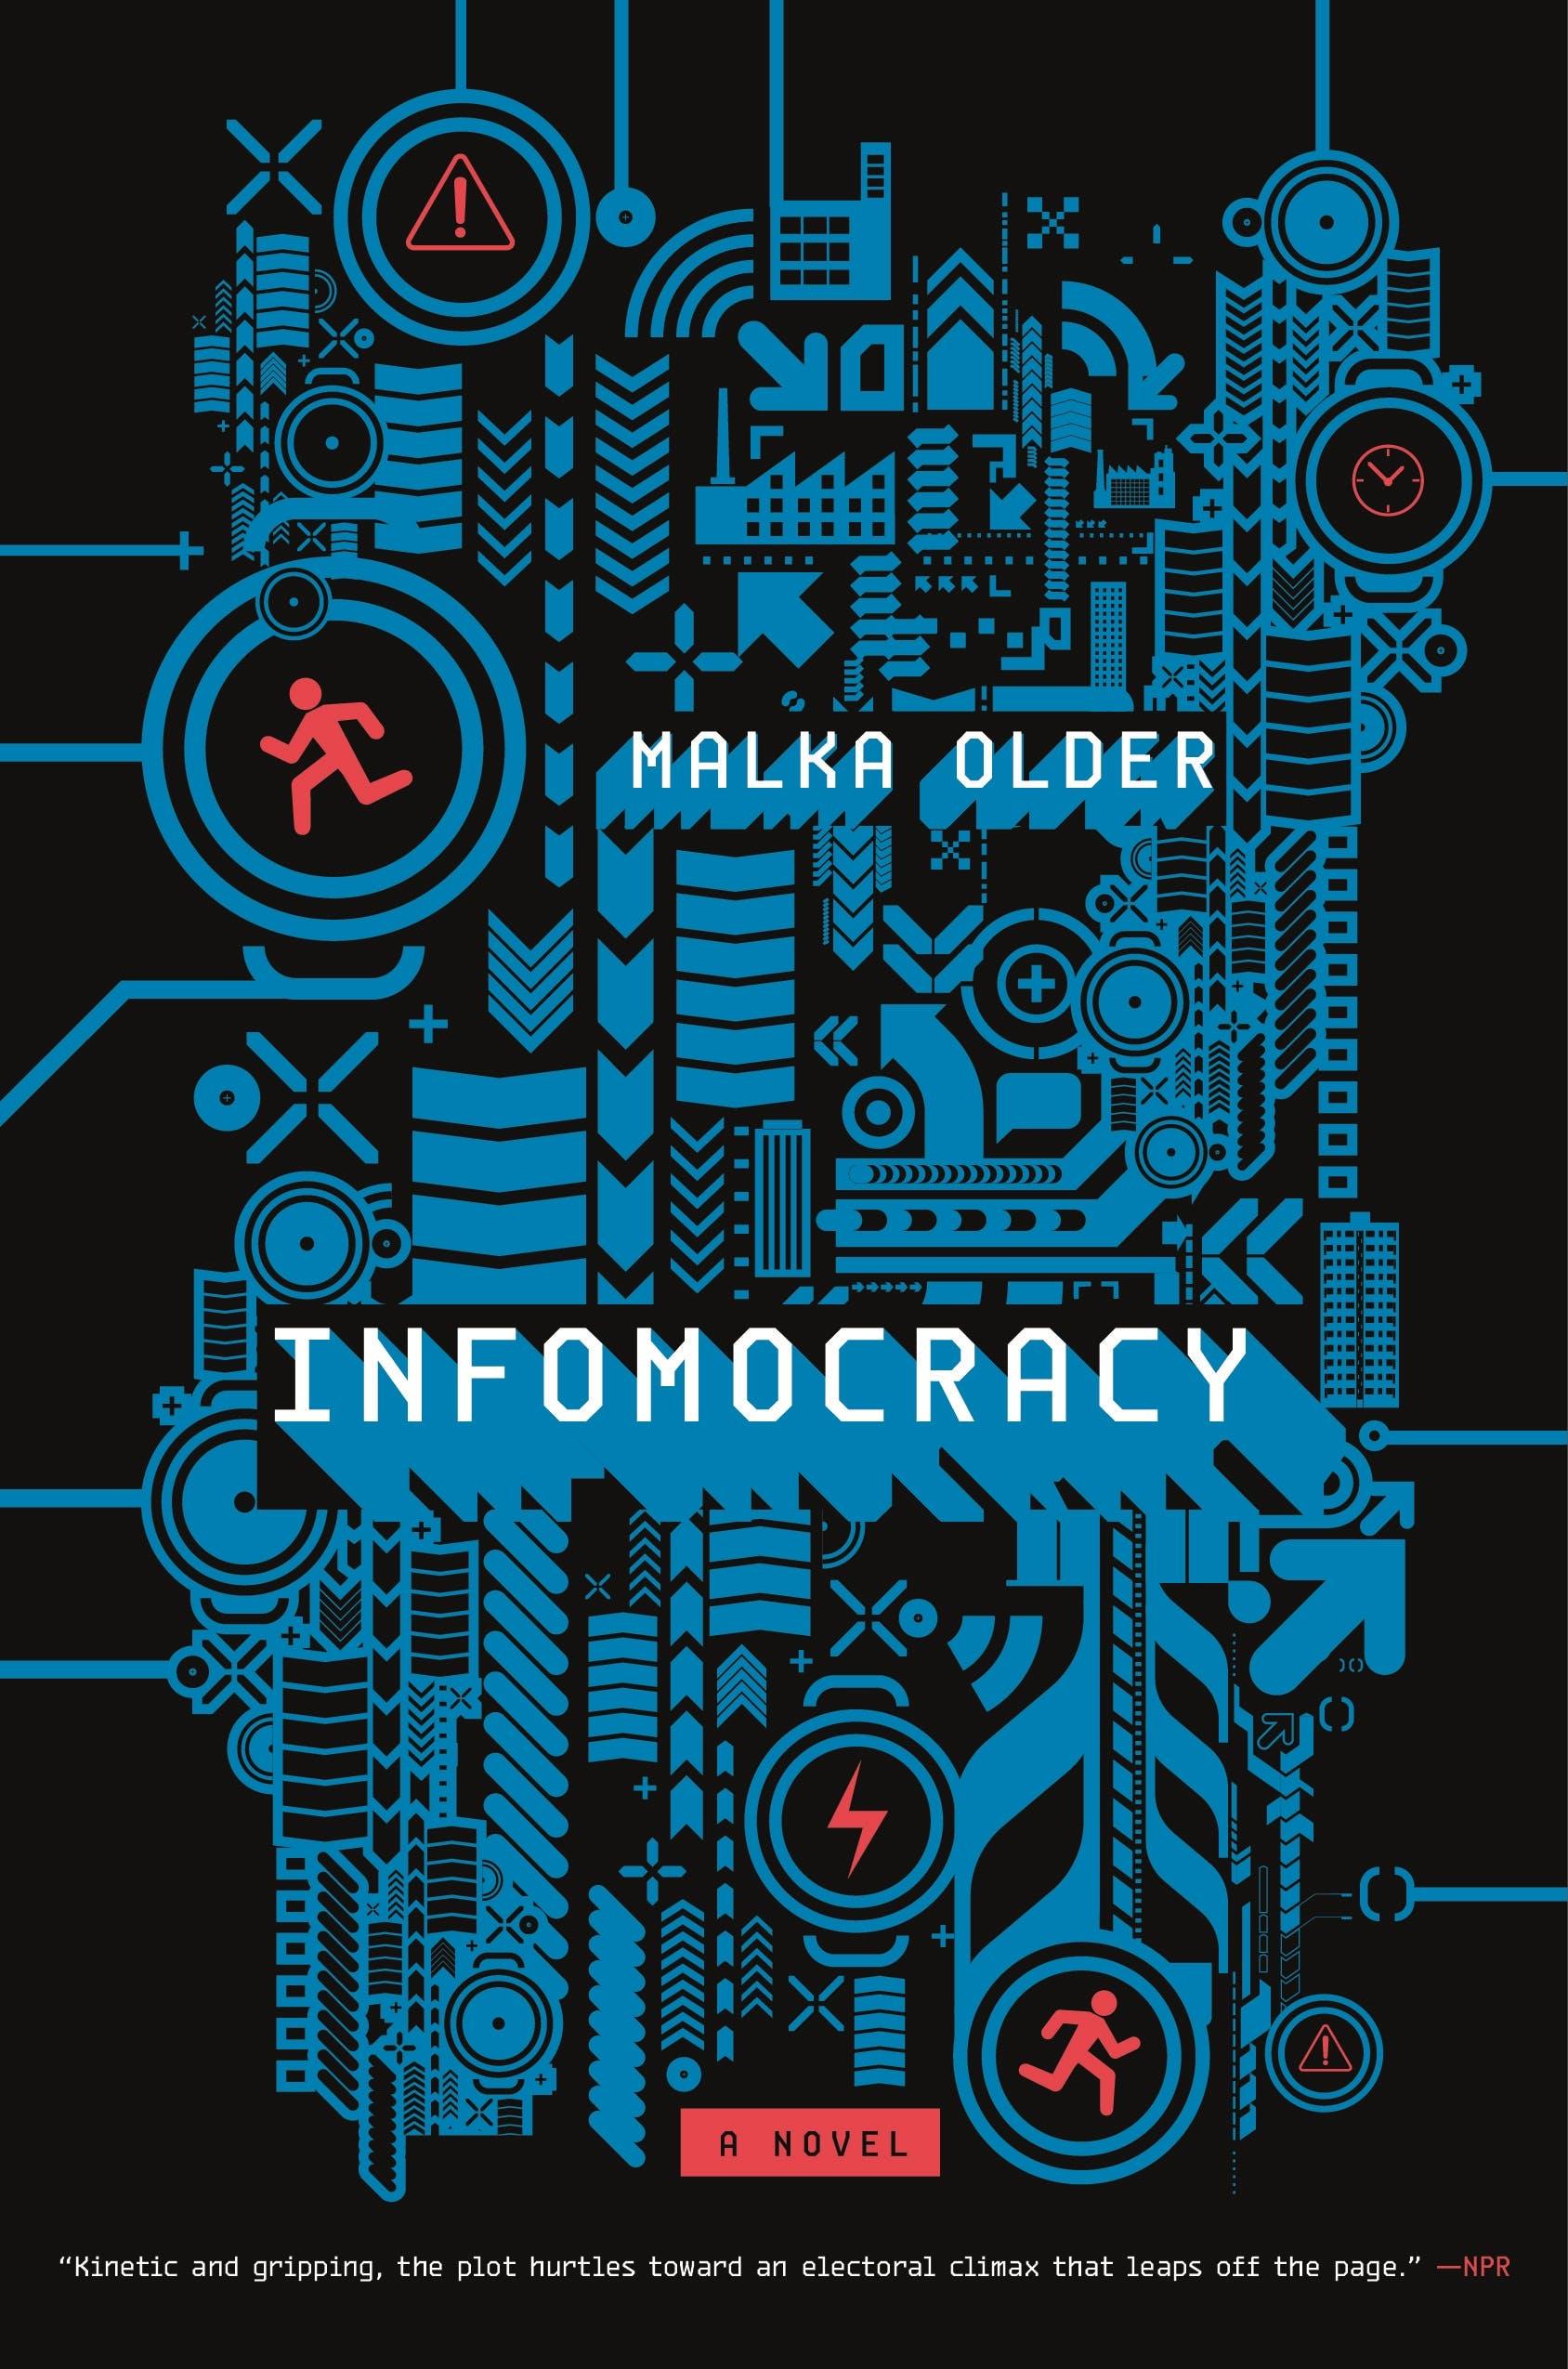 Image of Infomocracy